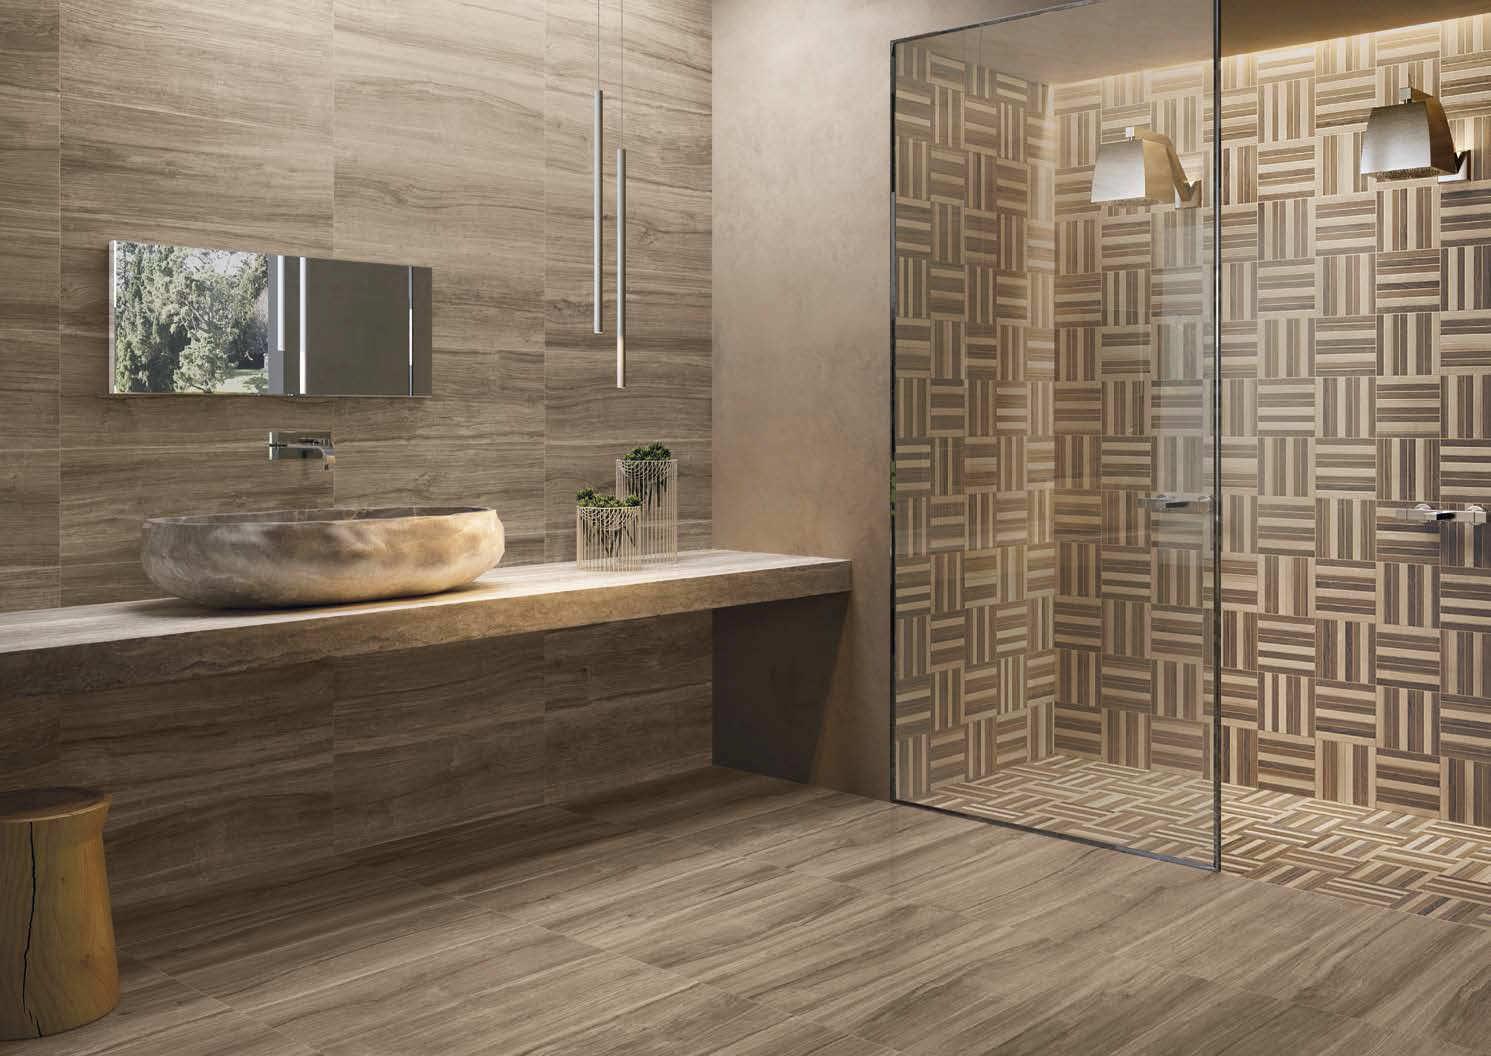 for Salle de bain avec carrelage imitation bois